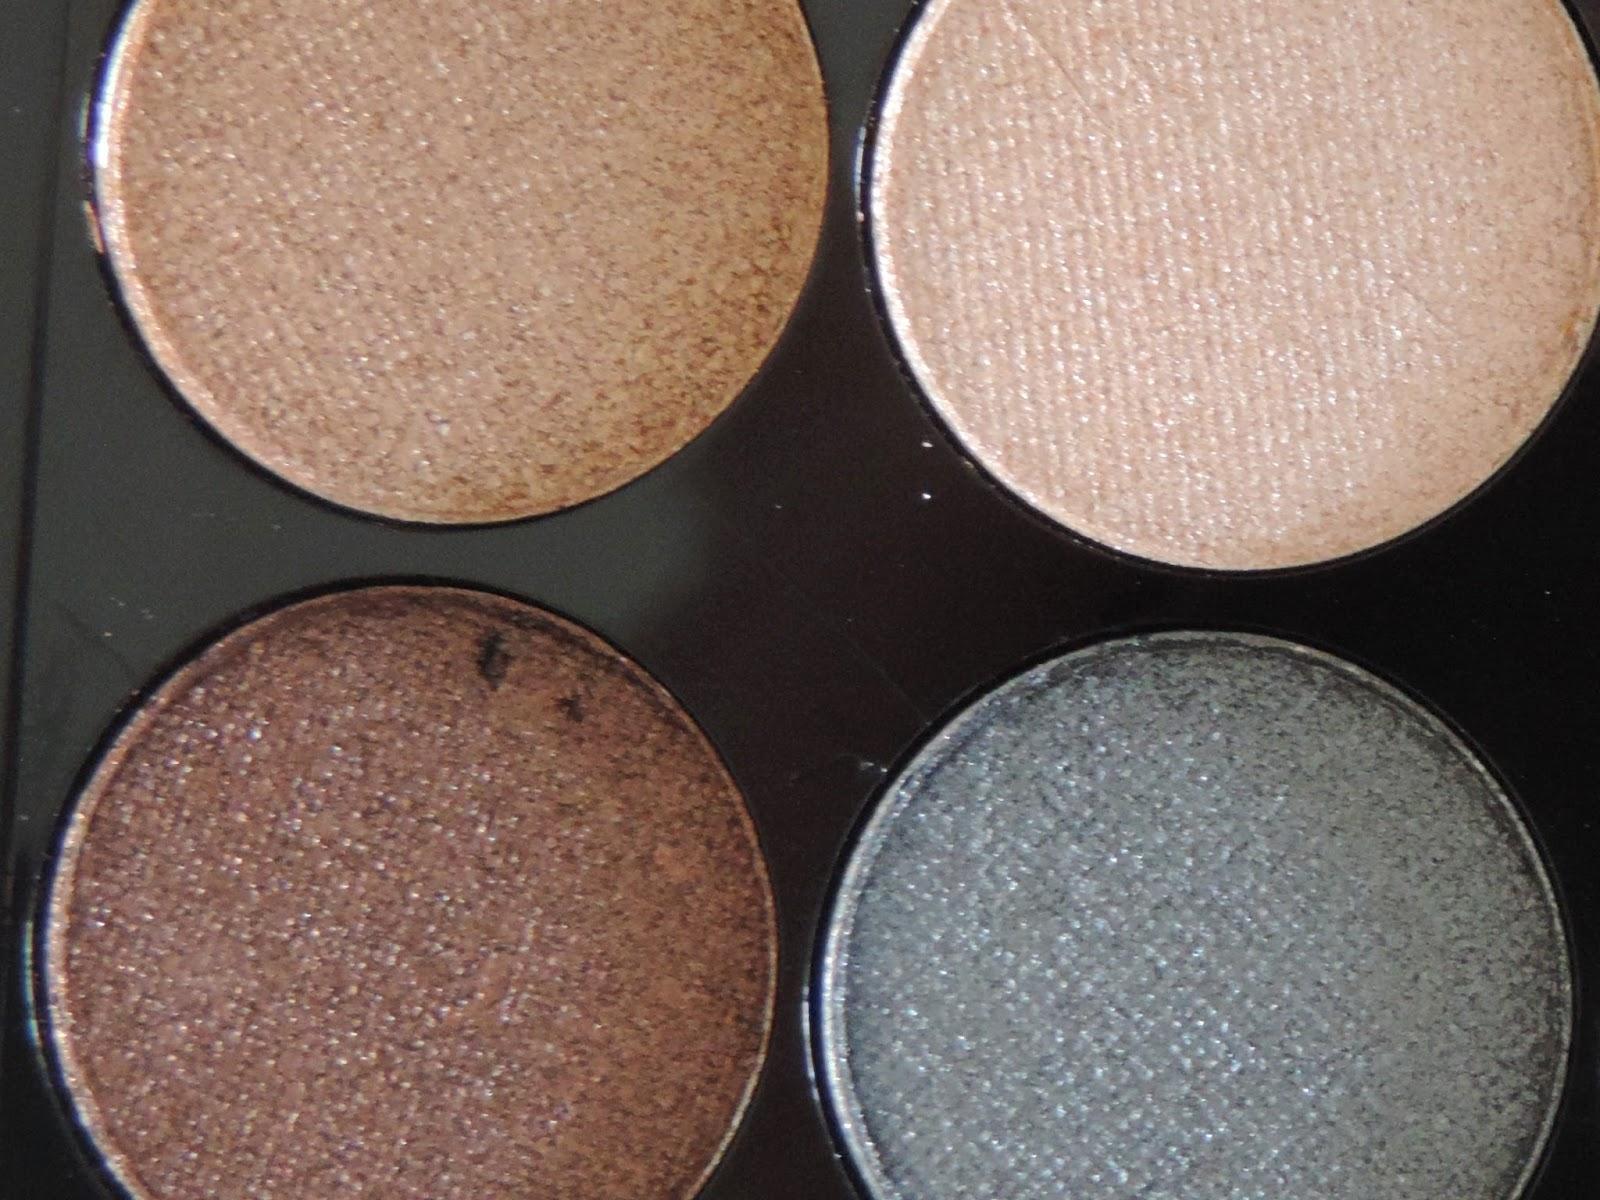 Close up of Sleek MakeUp iDivine Storm Palette